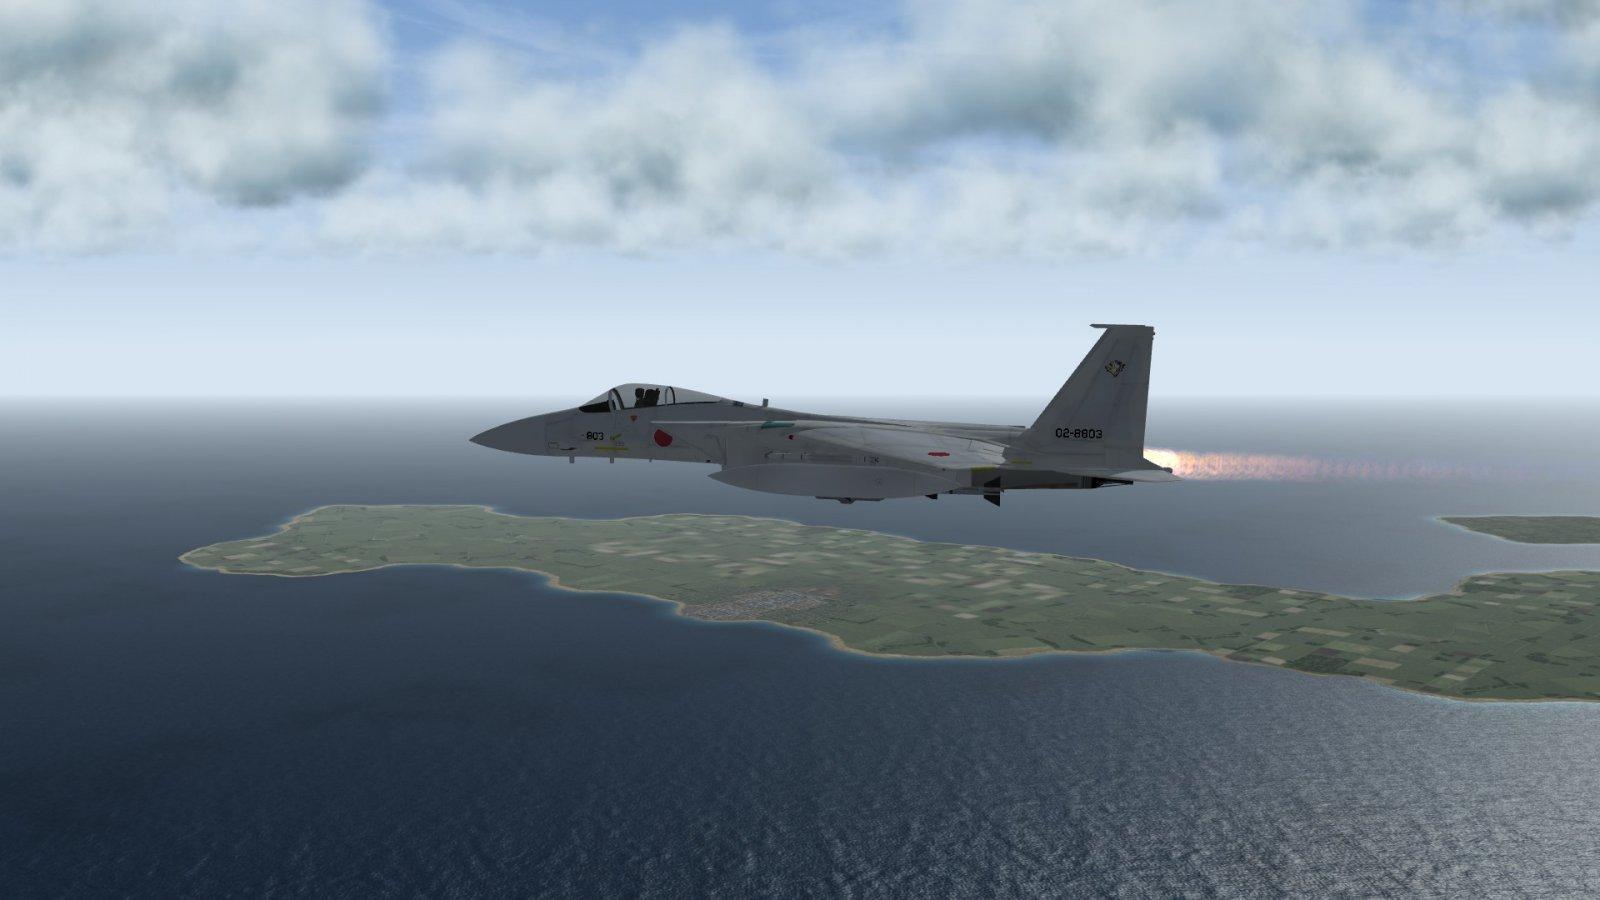 F-15J in Afterburner on Intercept